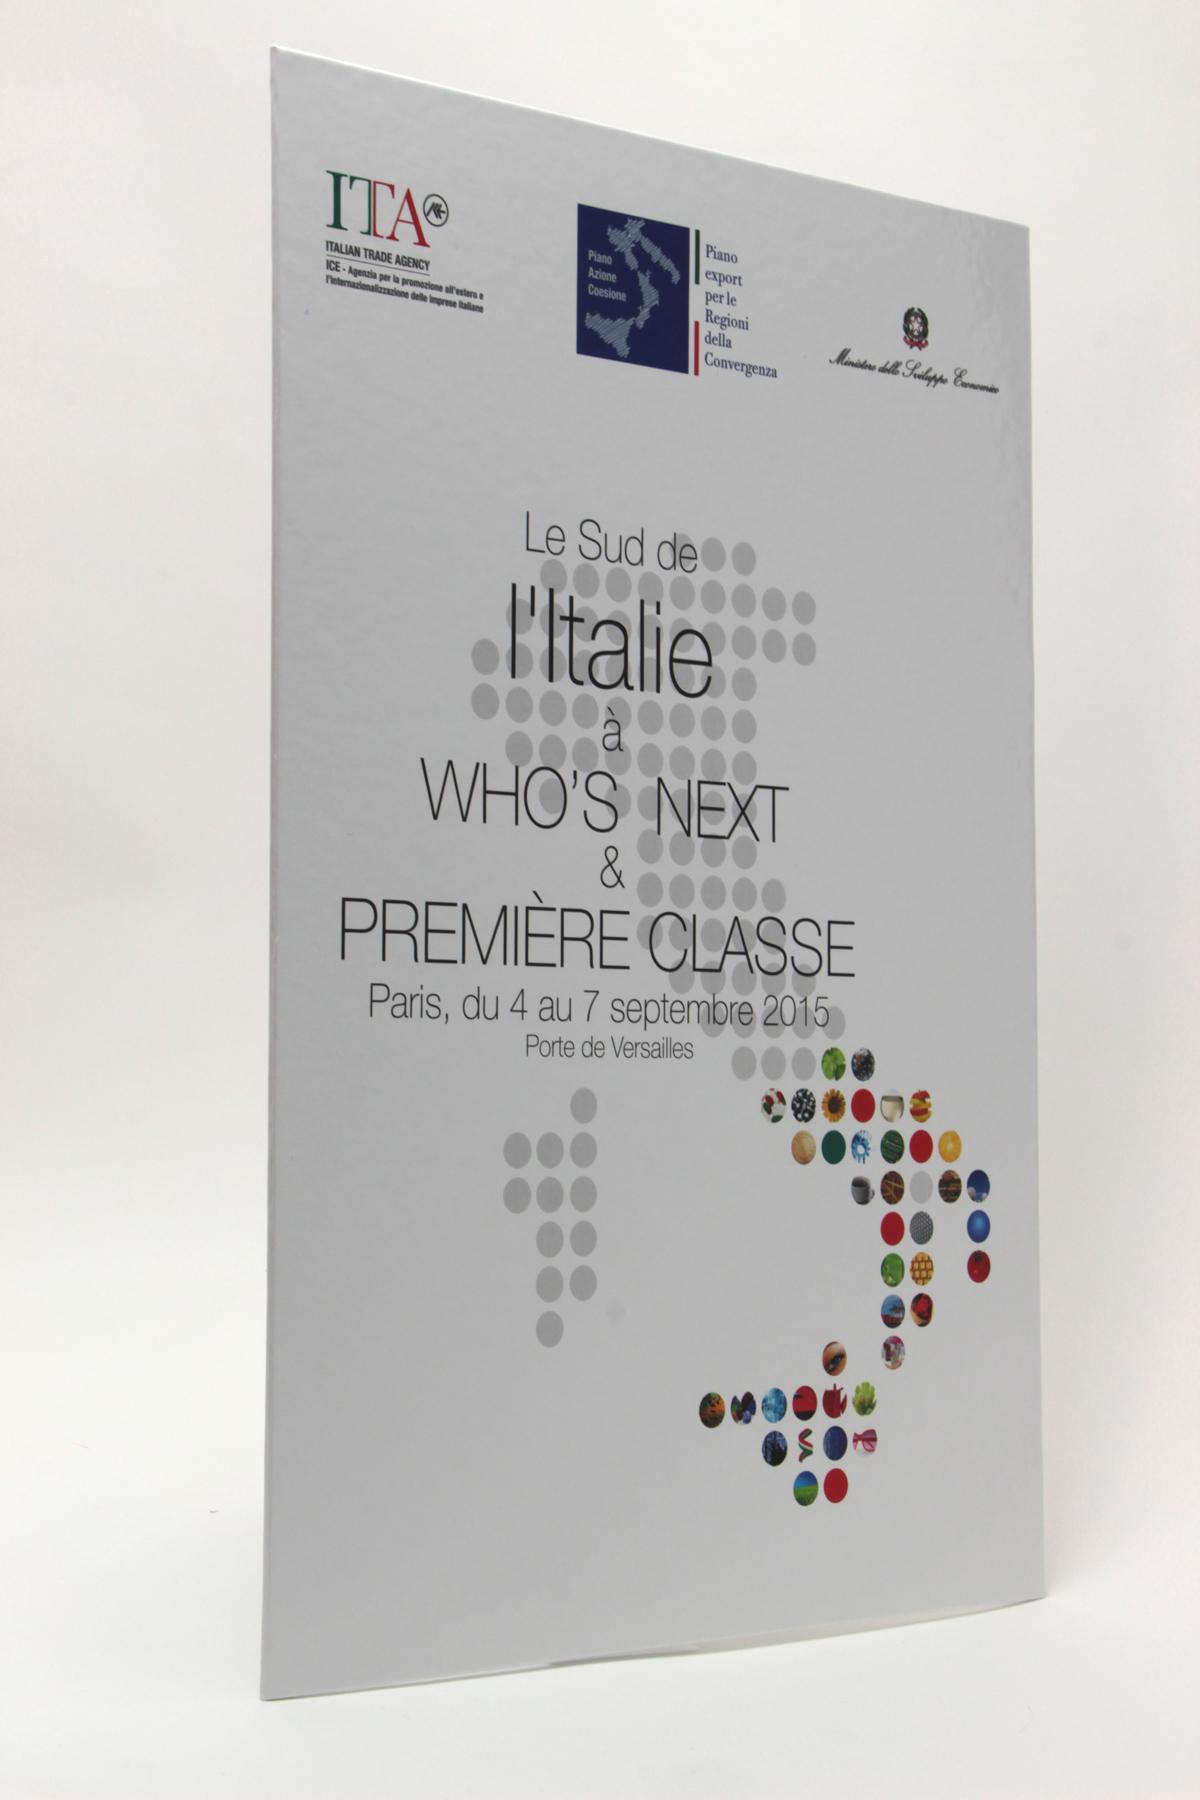 ITA Italian Trade Agency PLV auto-portante